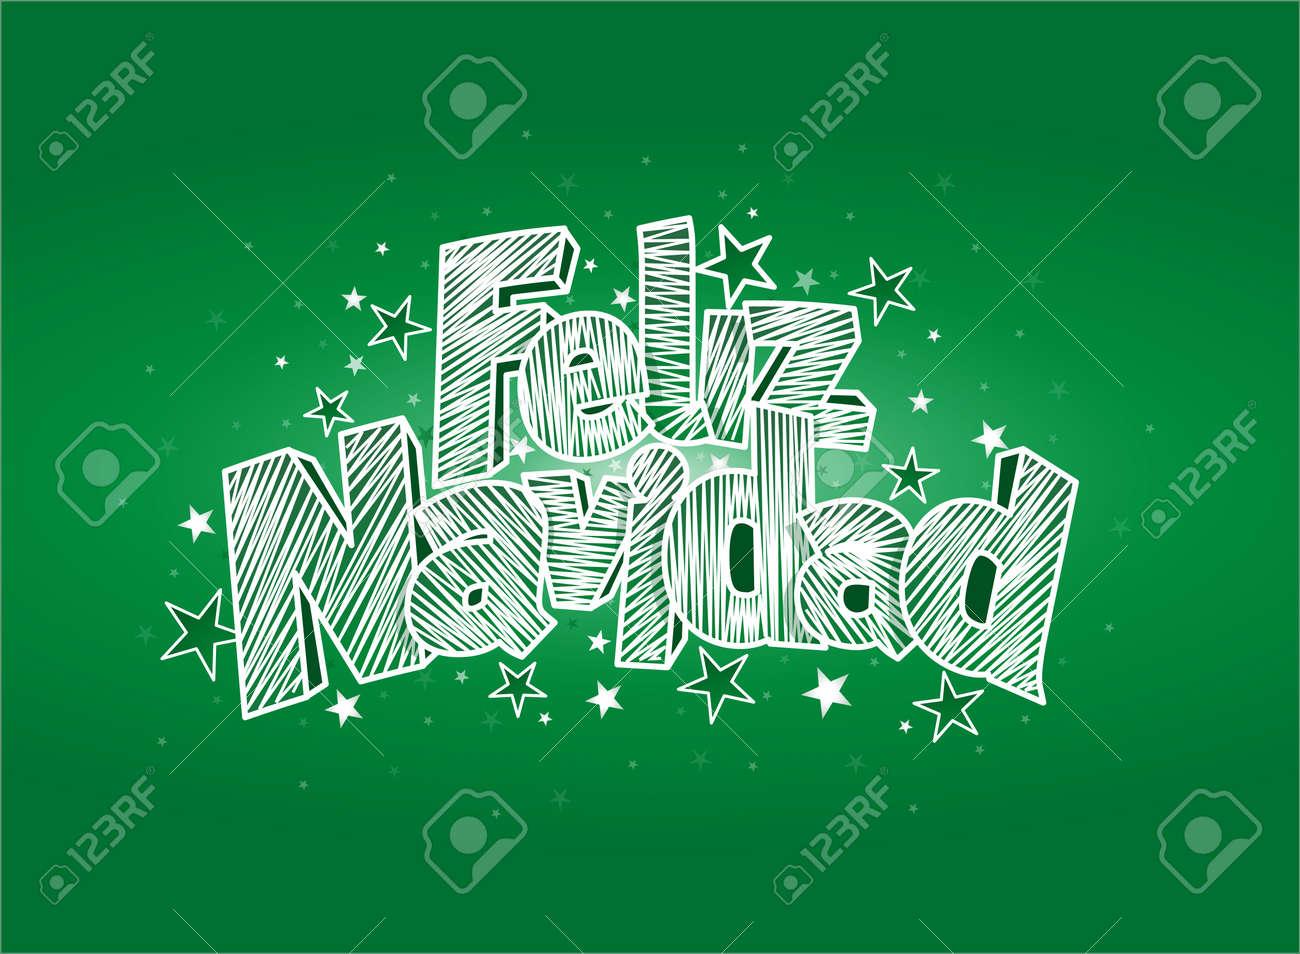 Feliz navidad merry christmas in spanish language green cover feliz navidad merry christmas in spanish language green cover of greeting card layout m4hsunfo